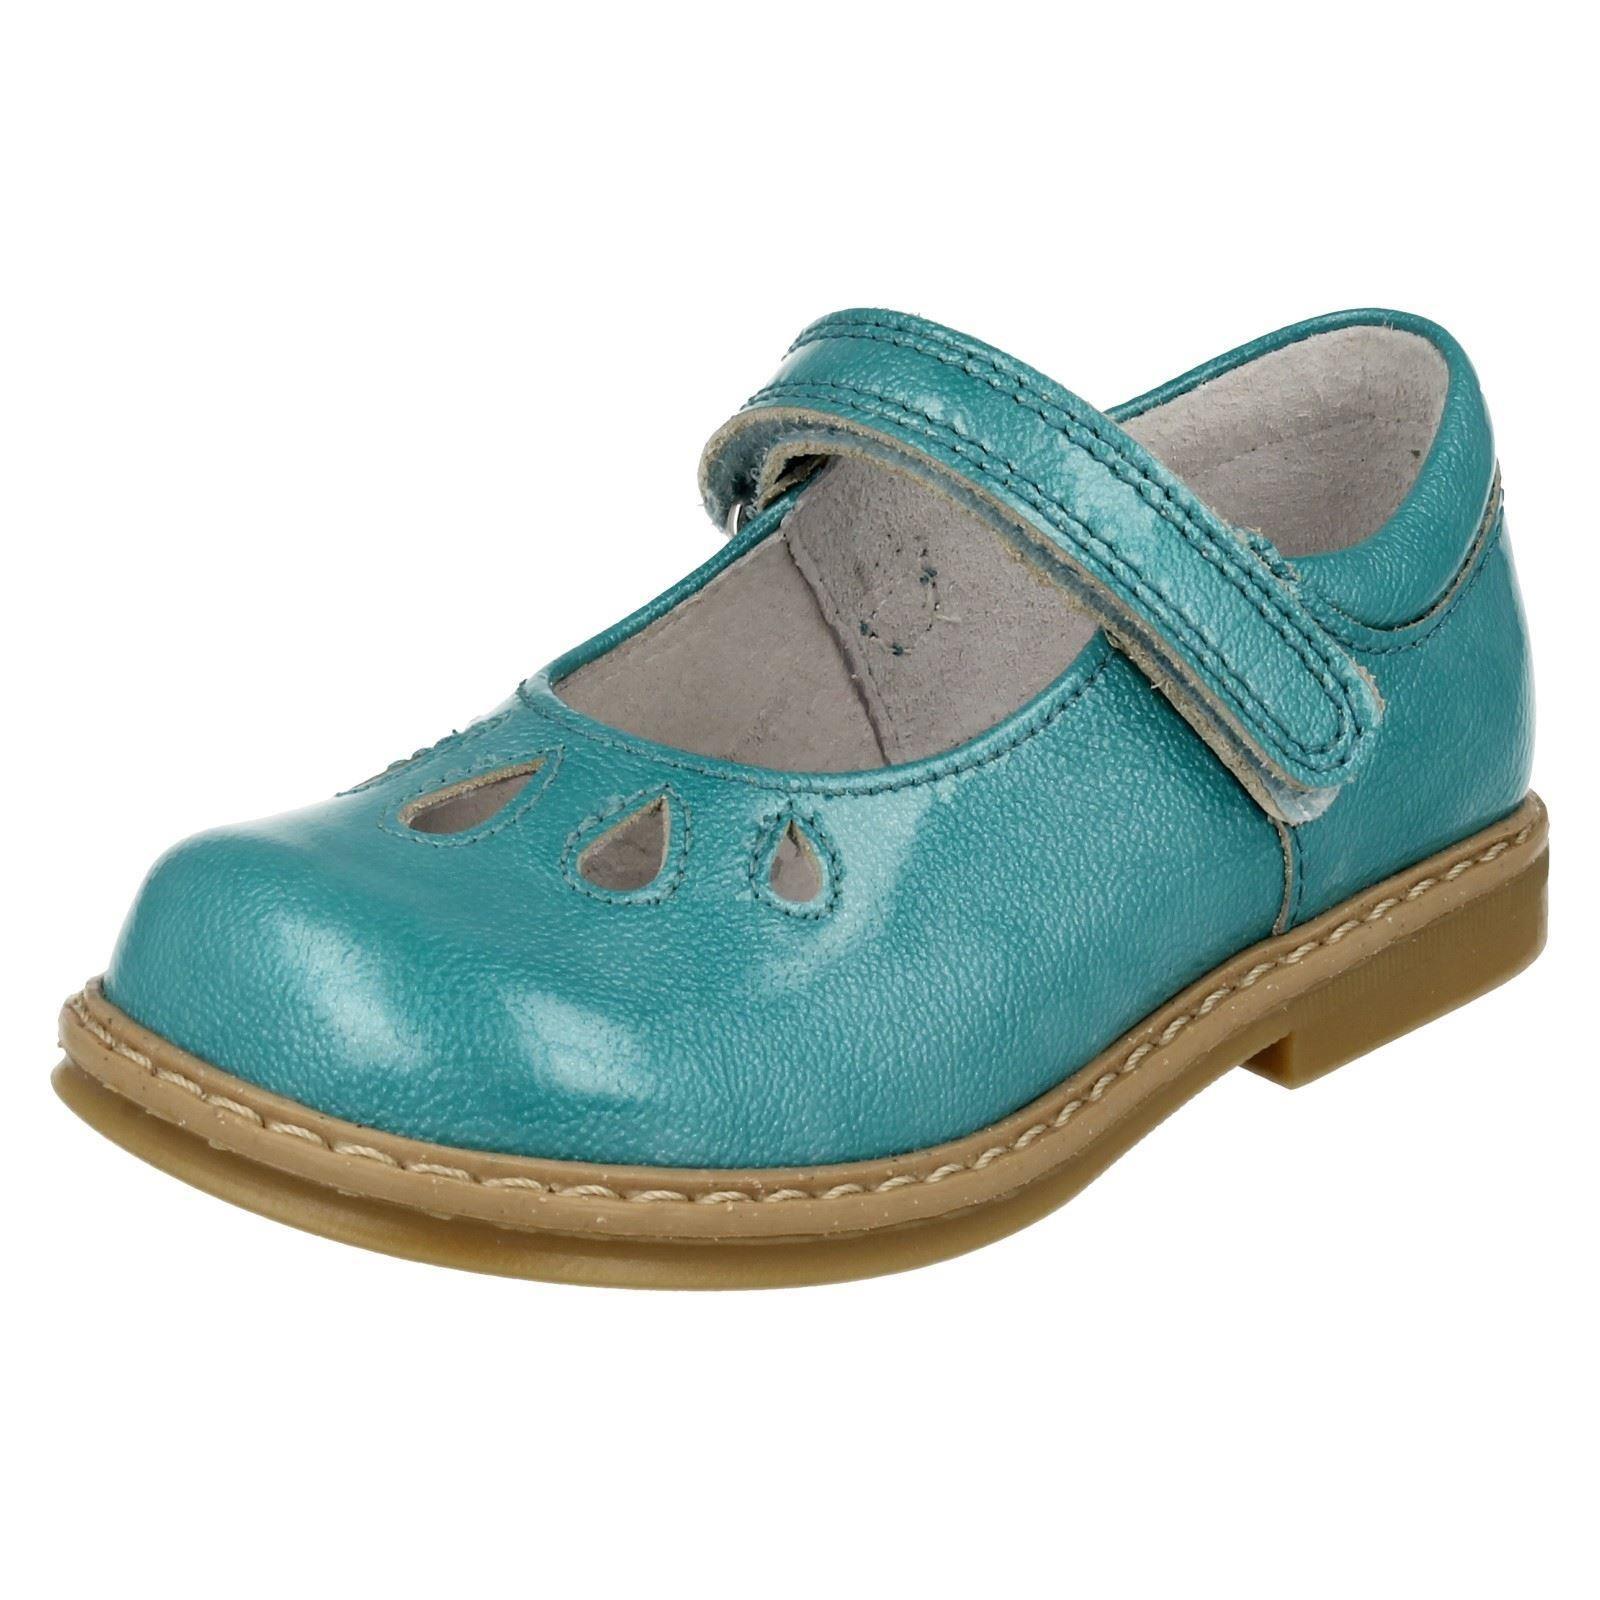 Girls-Casual-Startrite-Shoes-Tamara